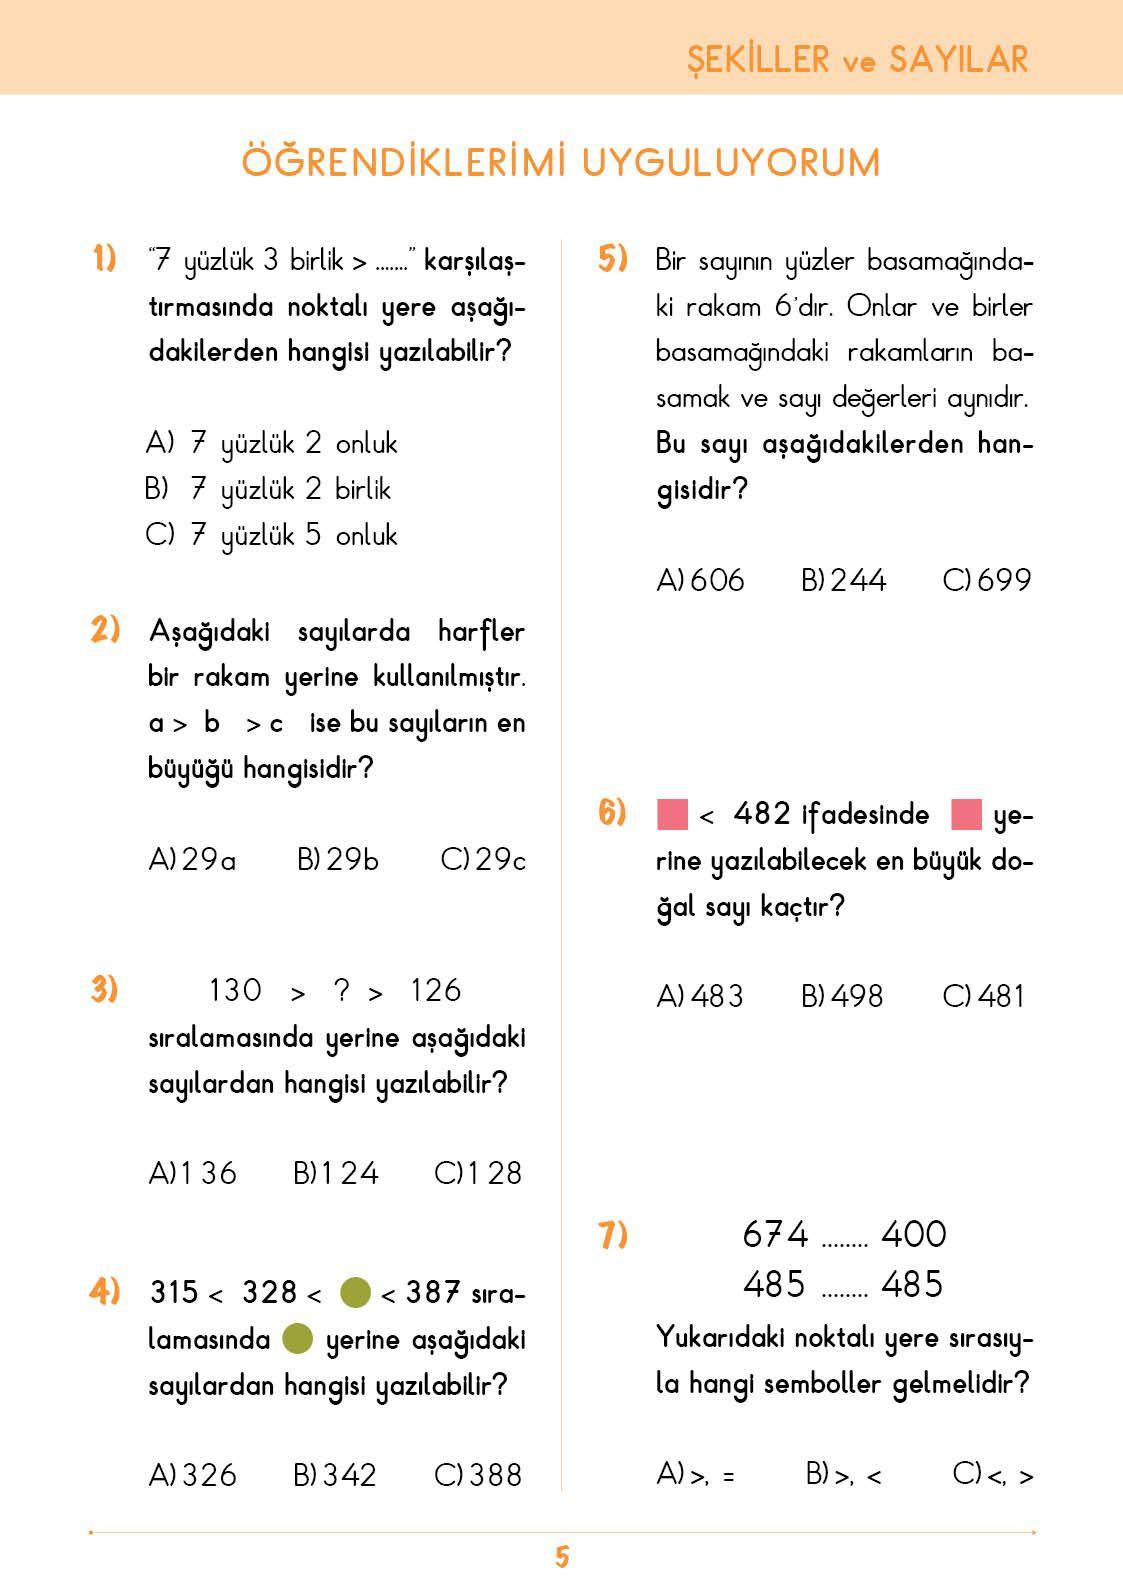 3 Sinif Konu Anlatim Matematik Bilgi Kutusu Matematik Ogretim